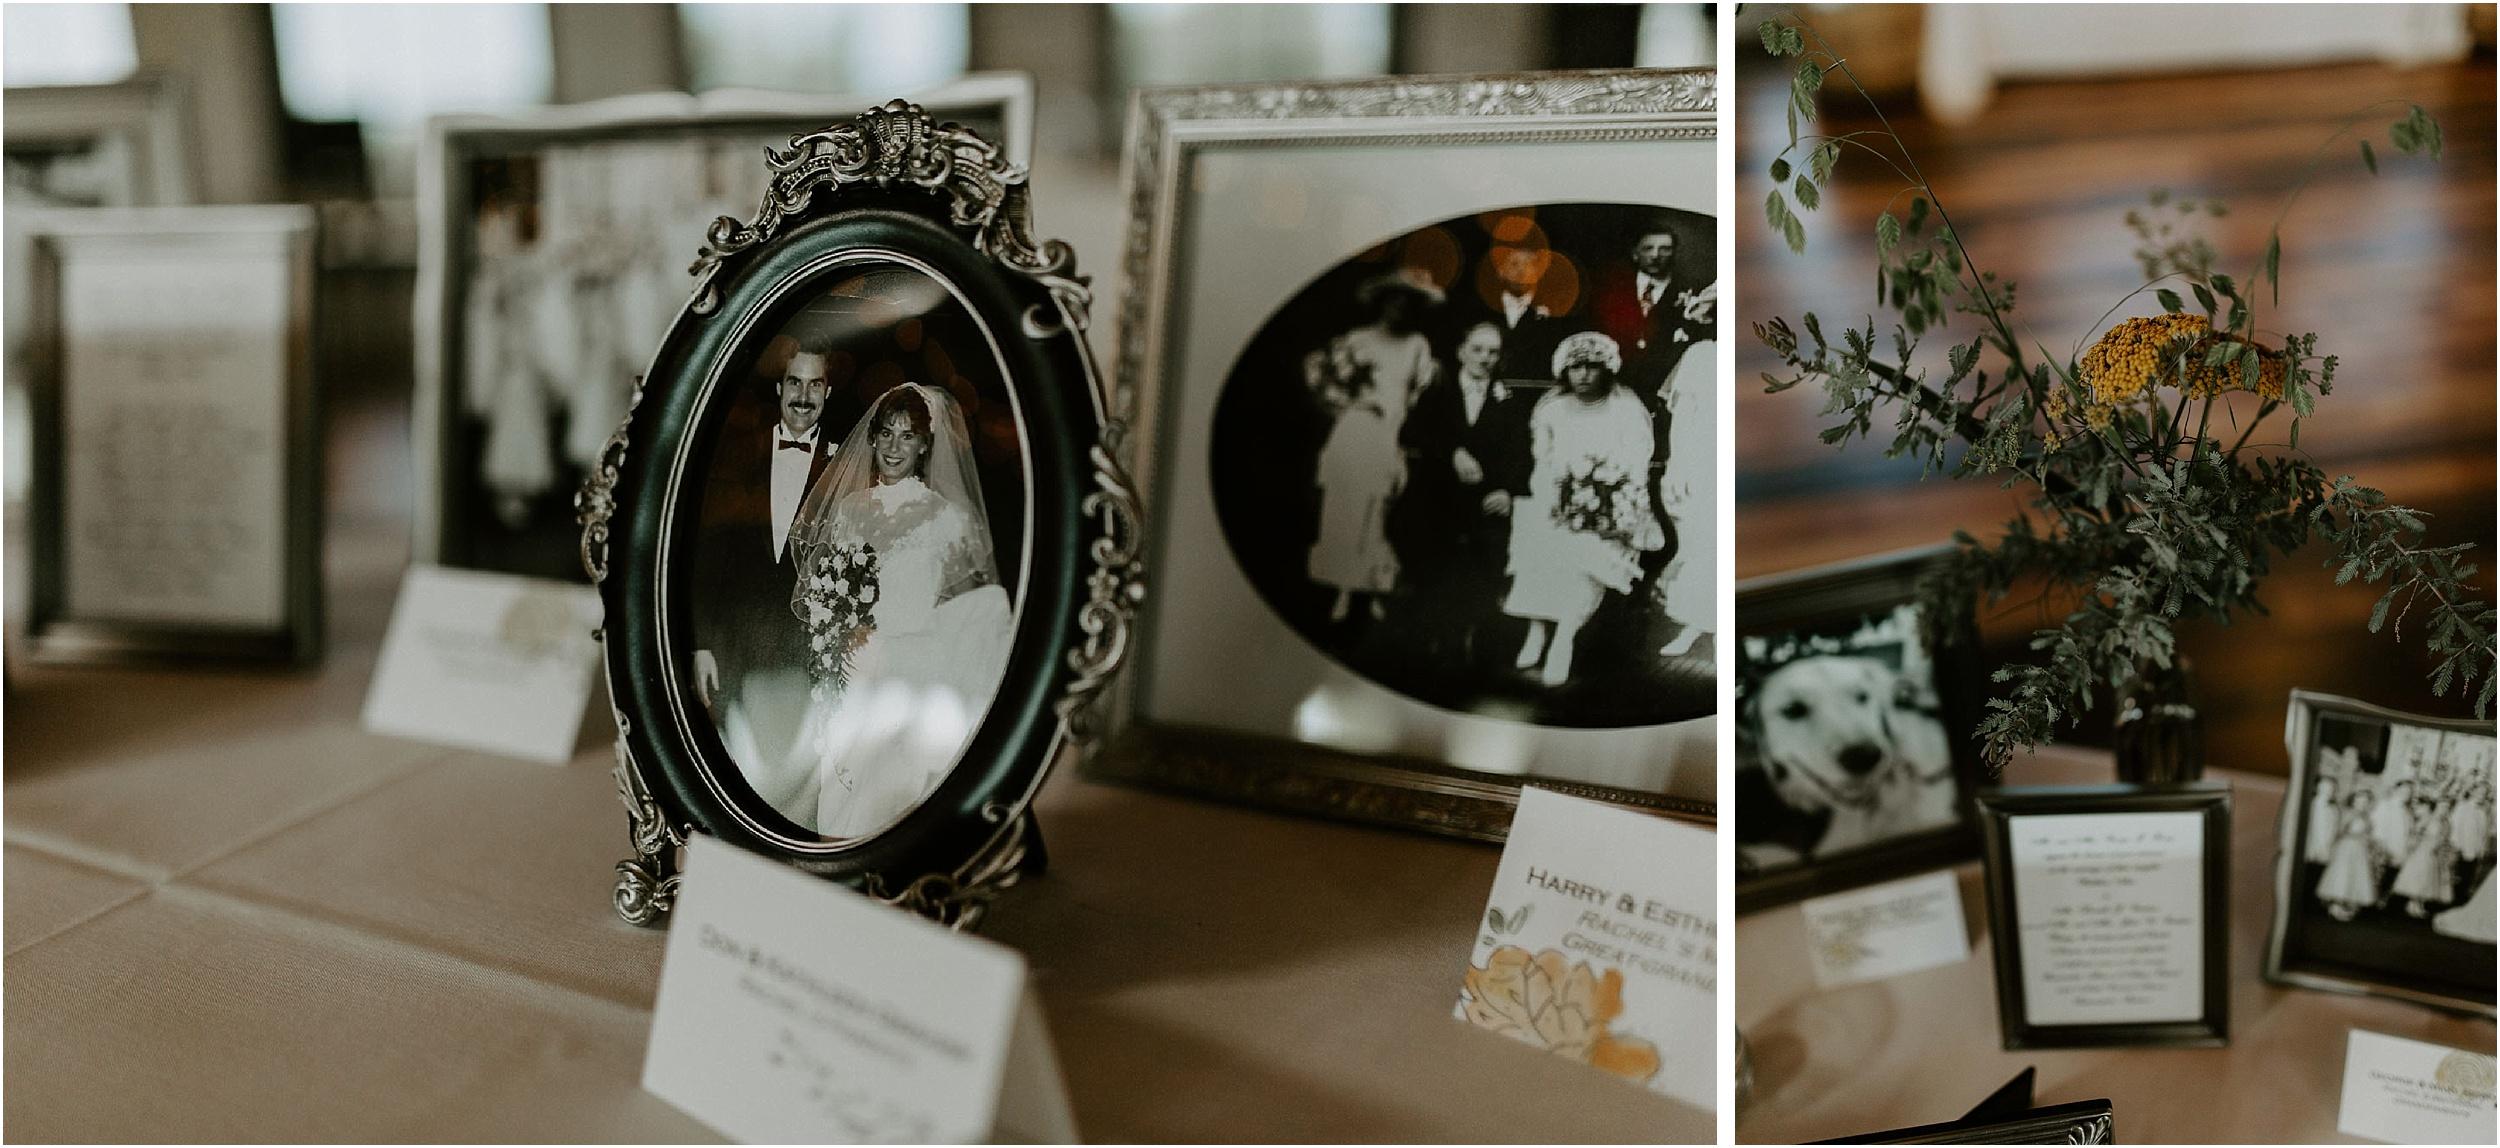 journeyman_distillery_wedding_photographer_chicago_il_wright_photographs-0707.jpg